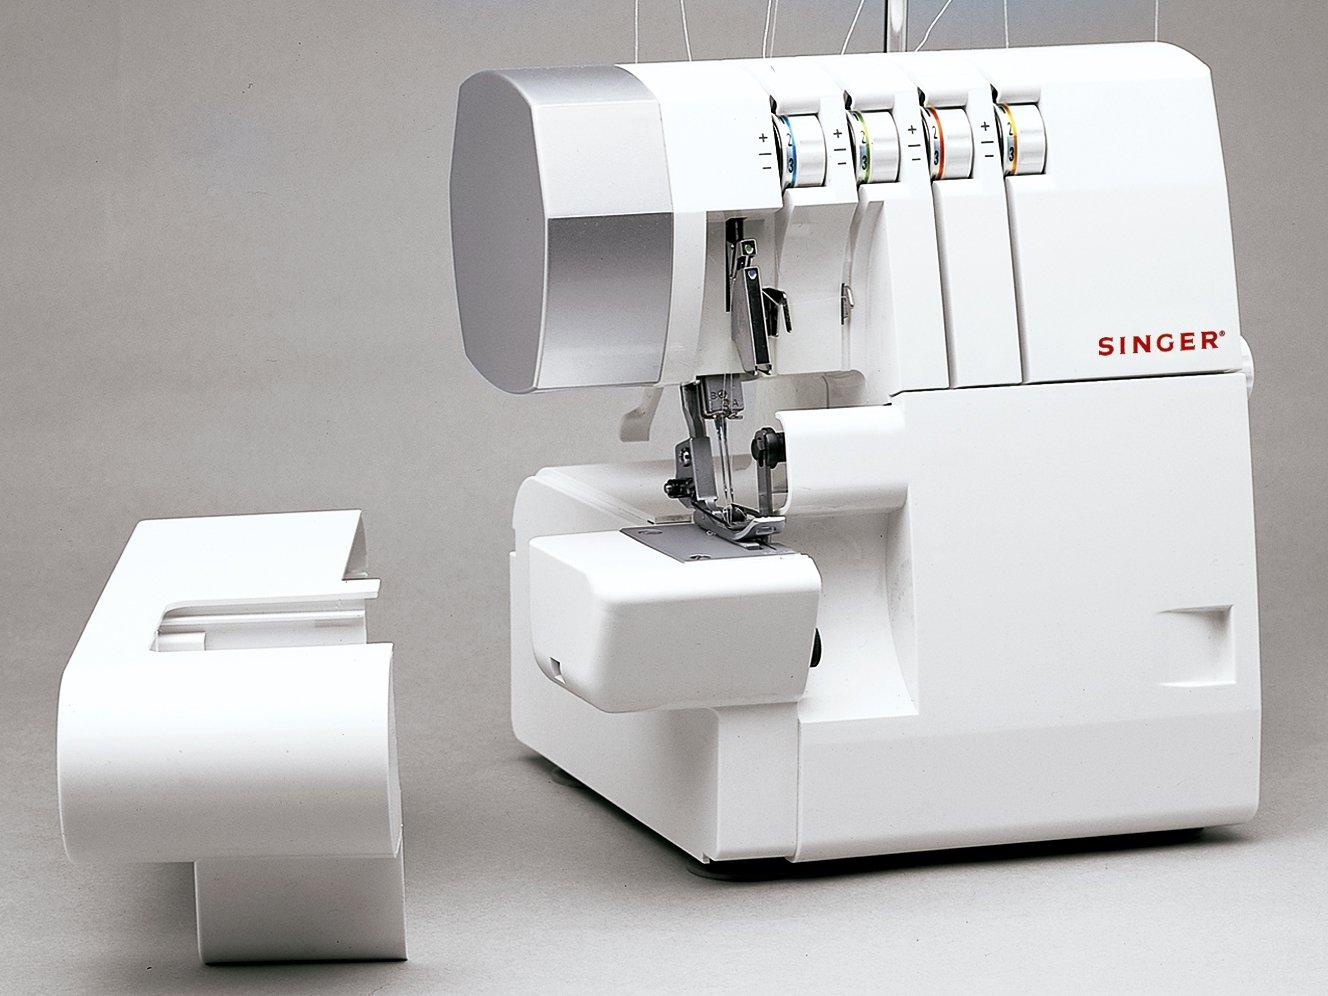 Máquina de Costura Overloque Singer Ultralock 14SH754 - Branca - 110V - 6